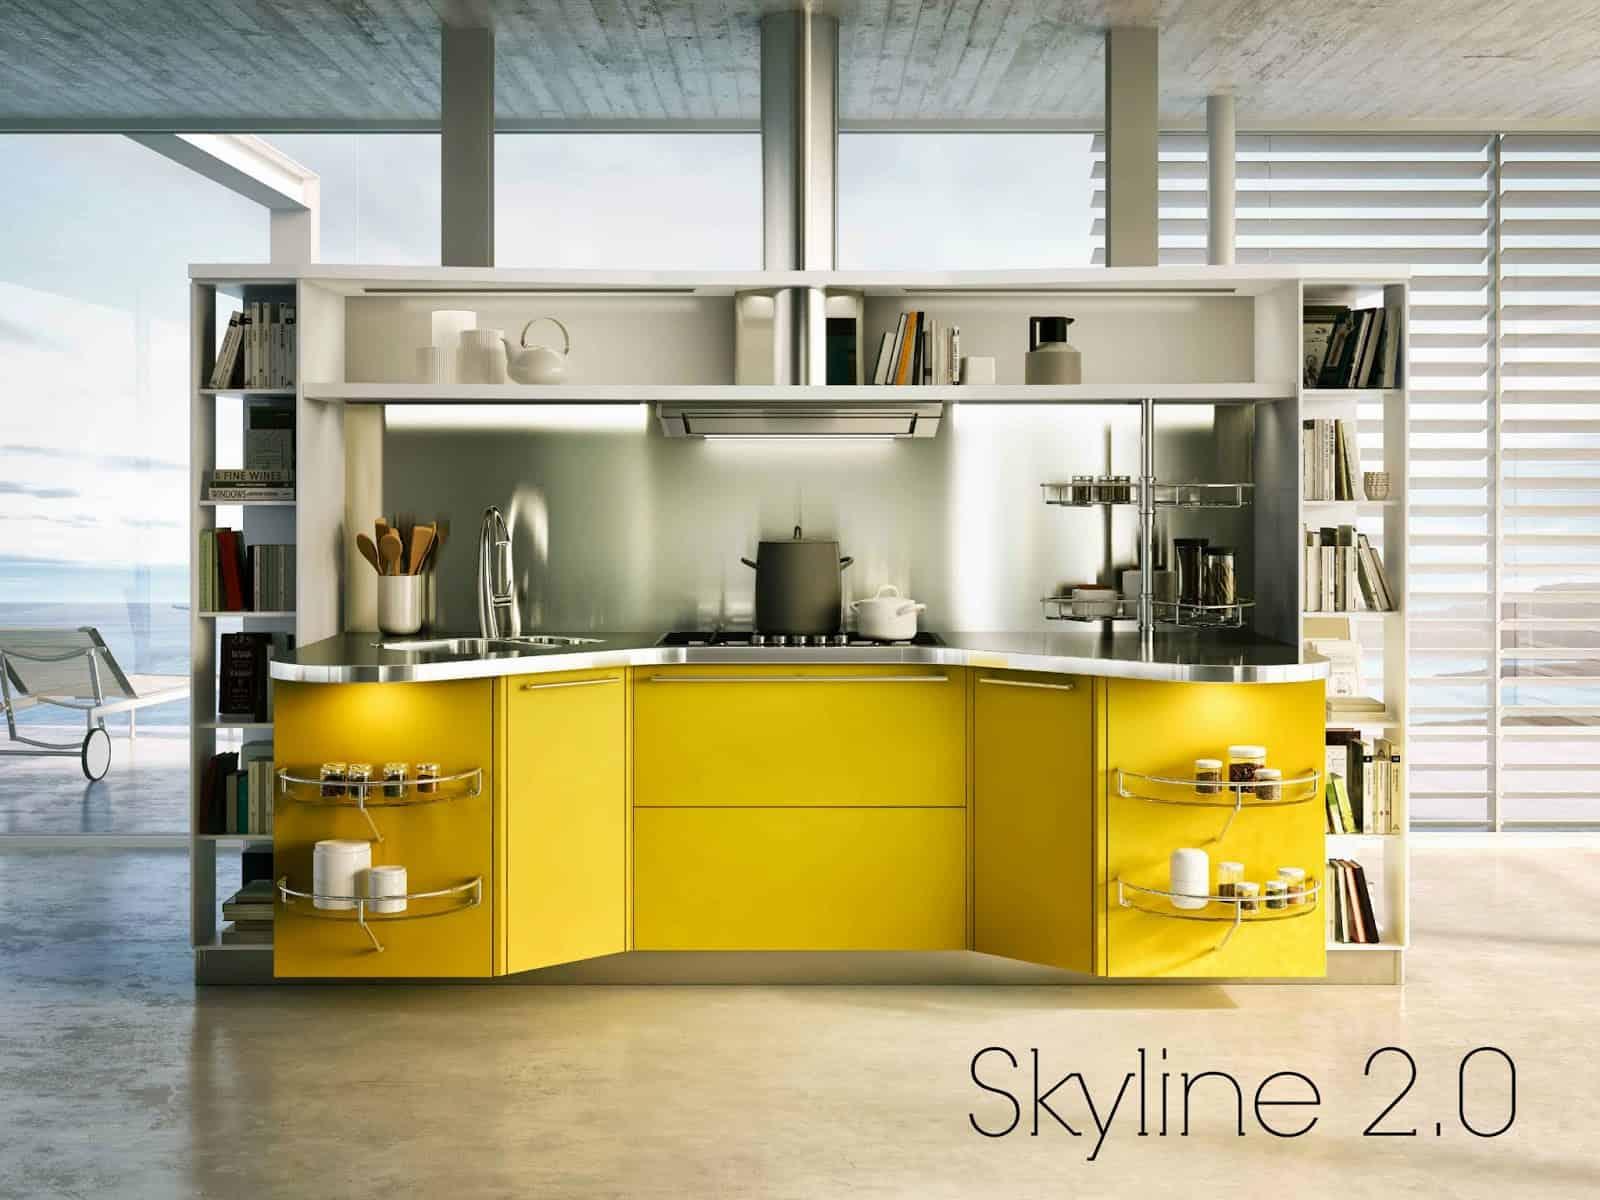 Idee per la cucina skyline 2 0 arscity - Idee per la cucina ...